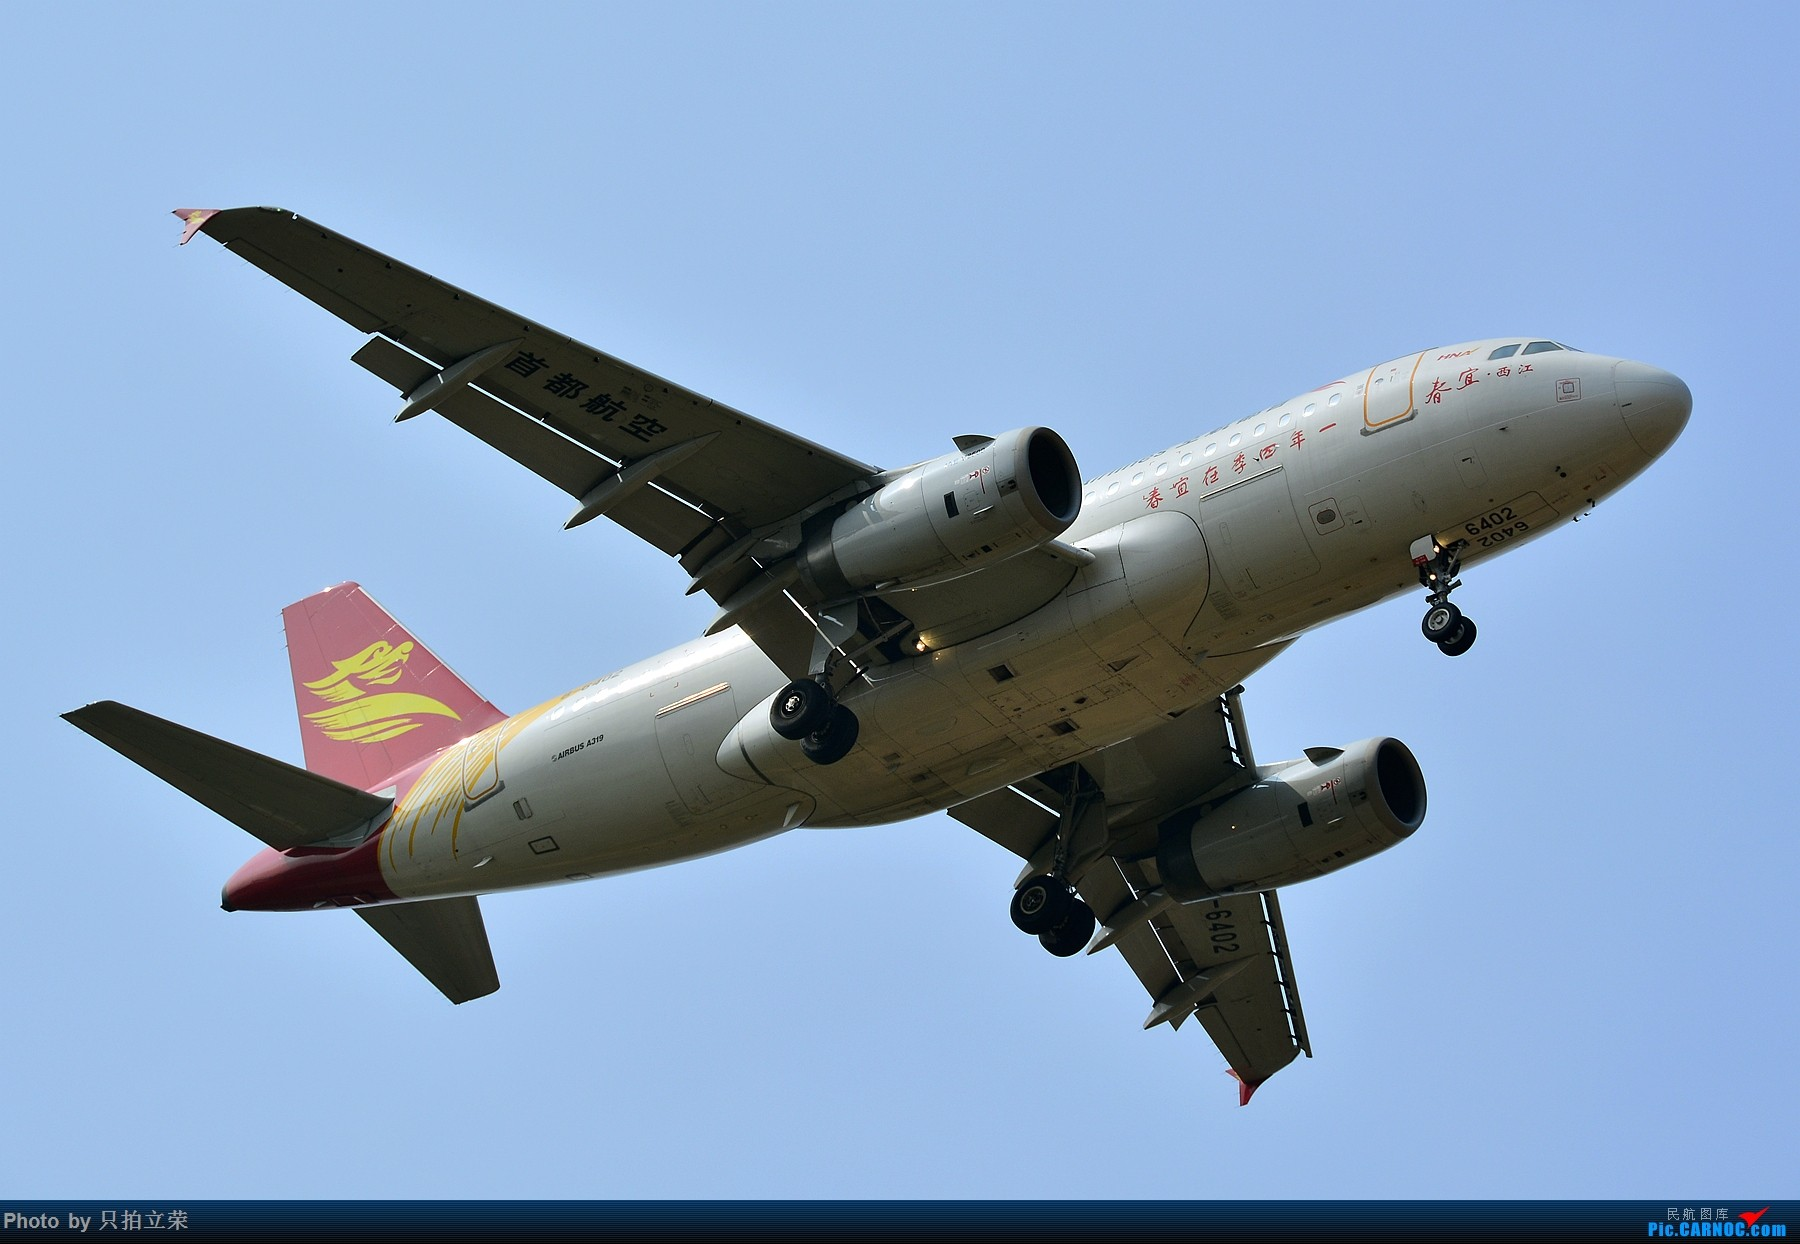 Re:[原创]湖南飞友会之10月9日长沙黄花好货满天飞! AIRBUS A319-100 B-6402 中国长沙黄花国际机场